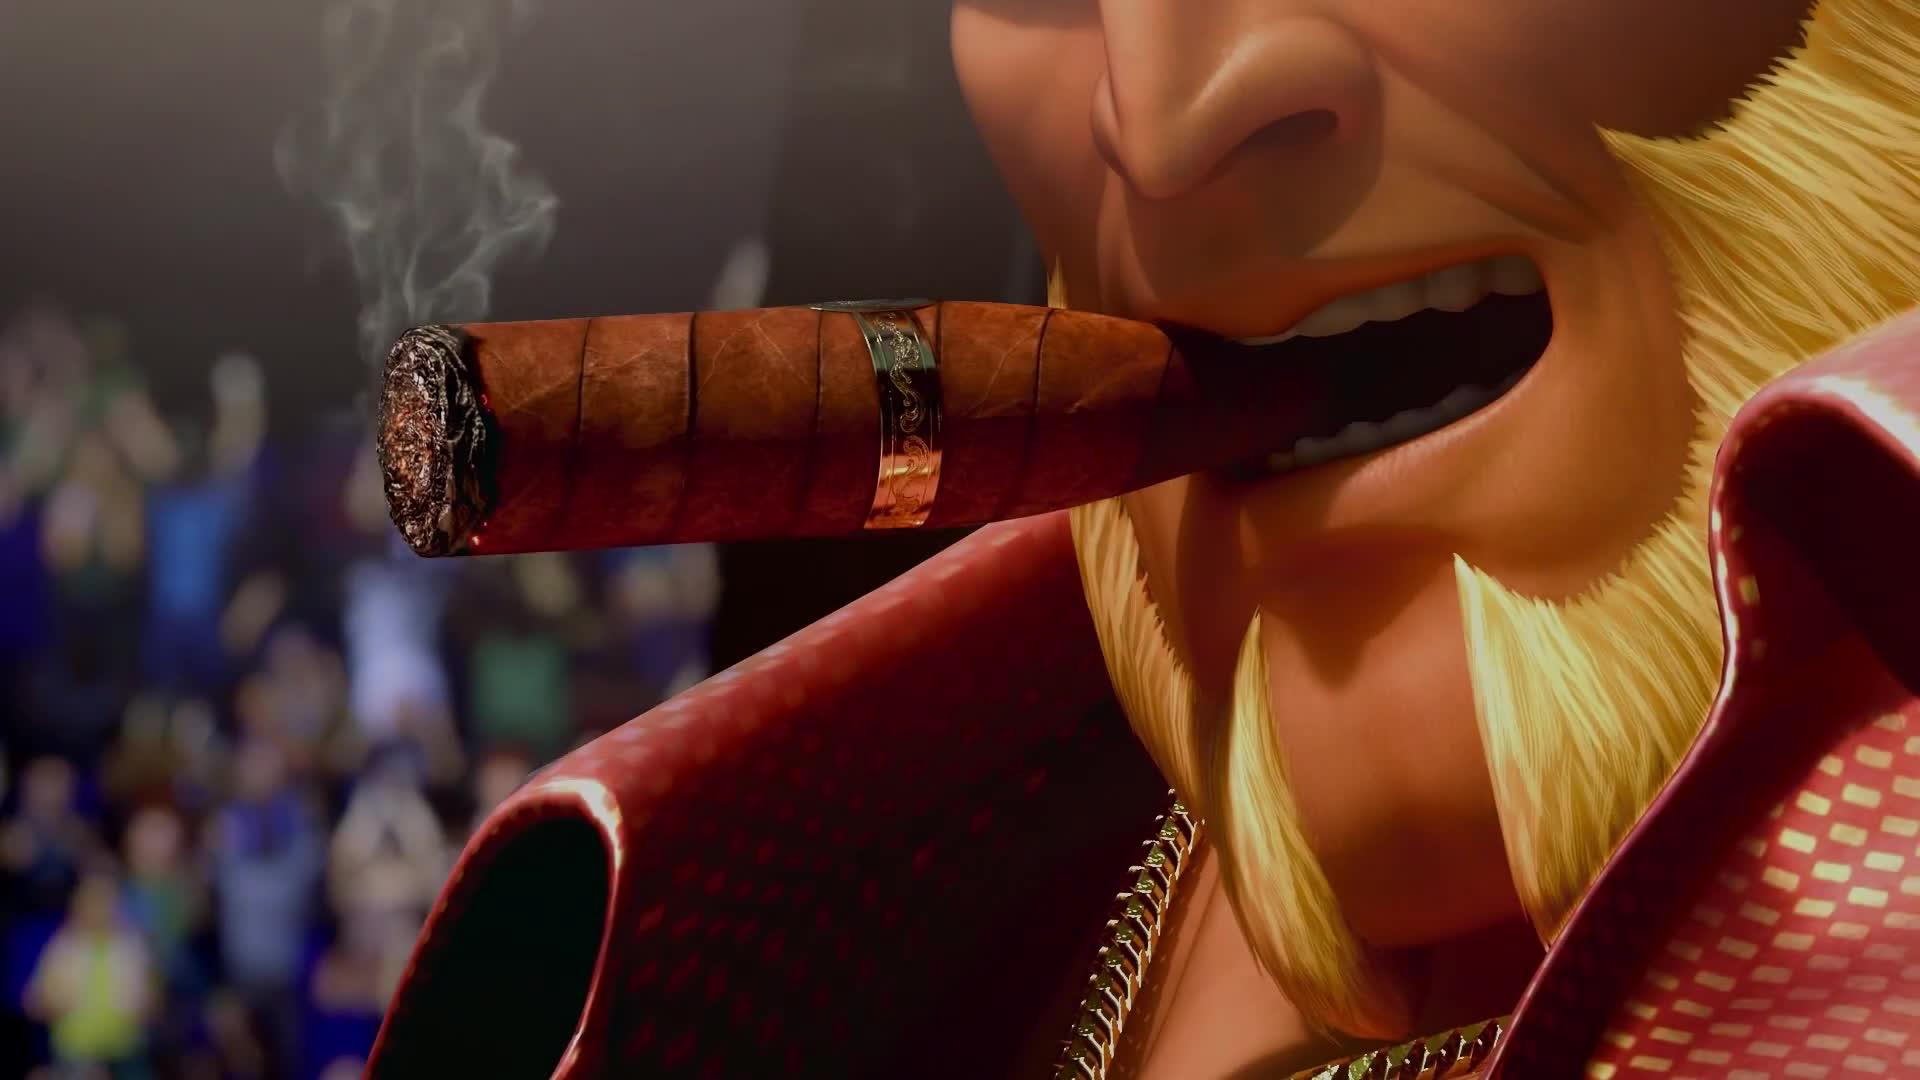 kof, kof 14, kof xiv, The King of Fighters XIV - All Story Mode Cinematic Cutscenes GIFs